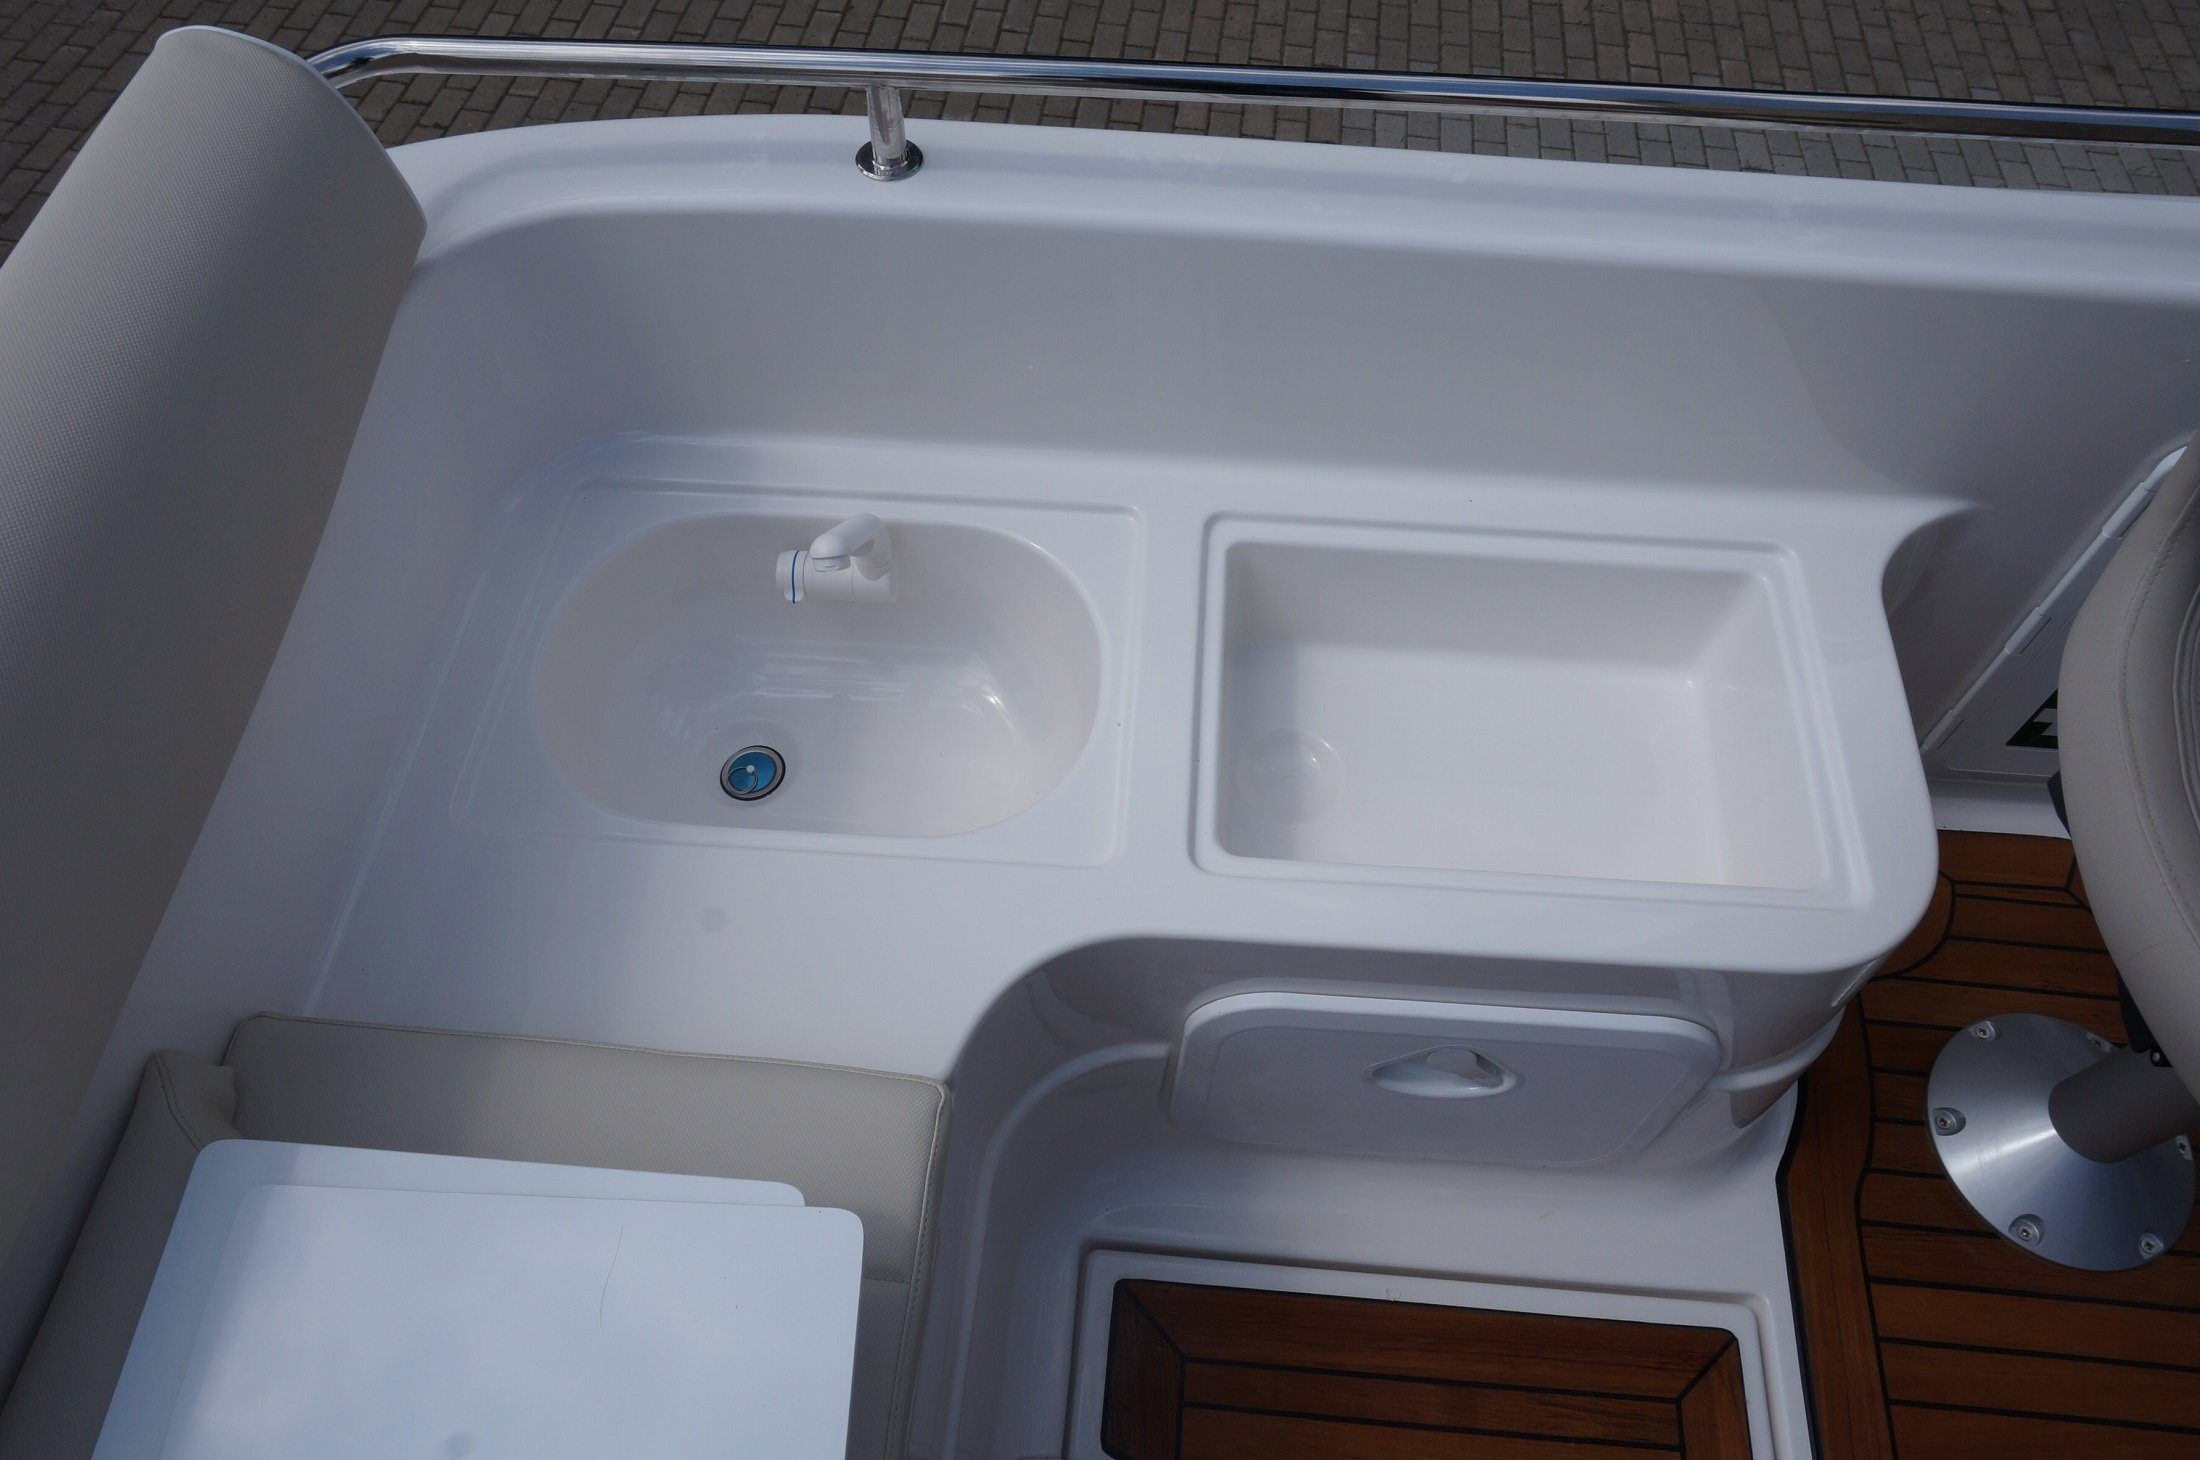 sun cruiser 650 hidden tap